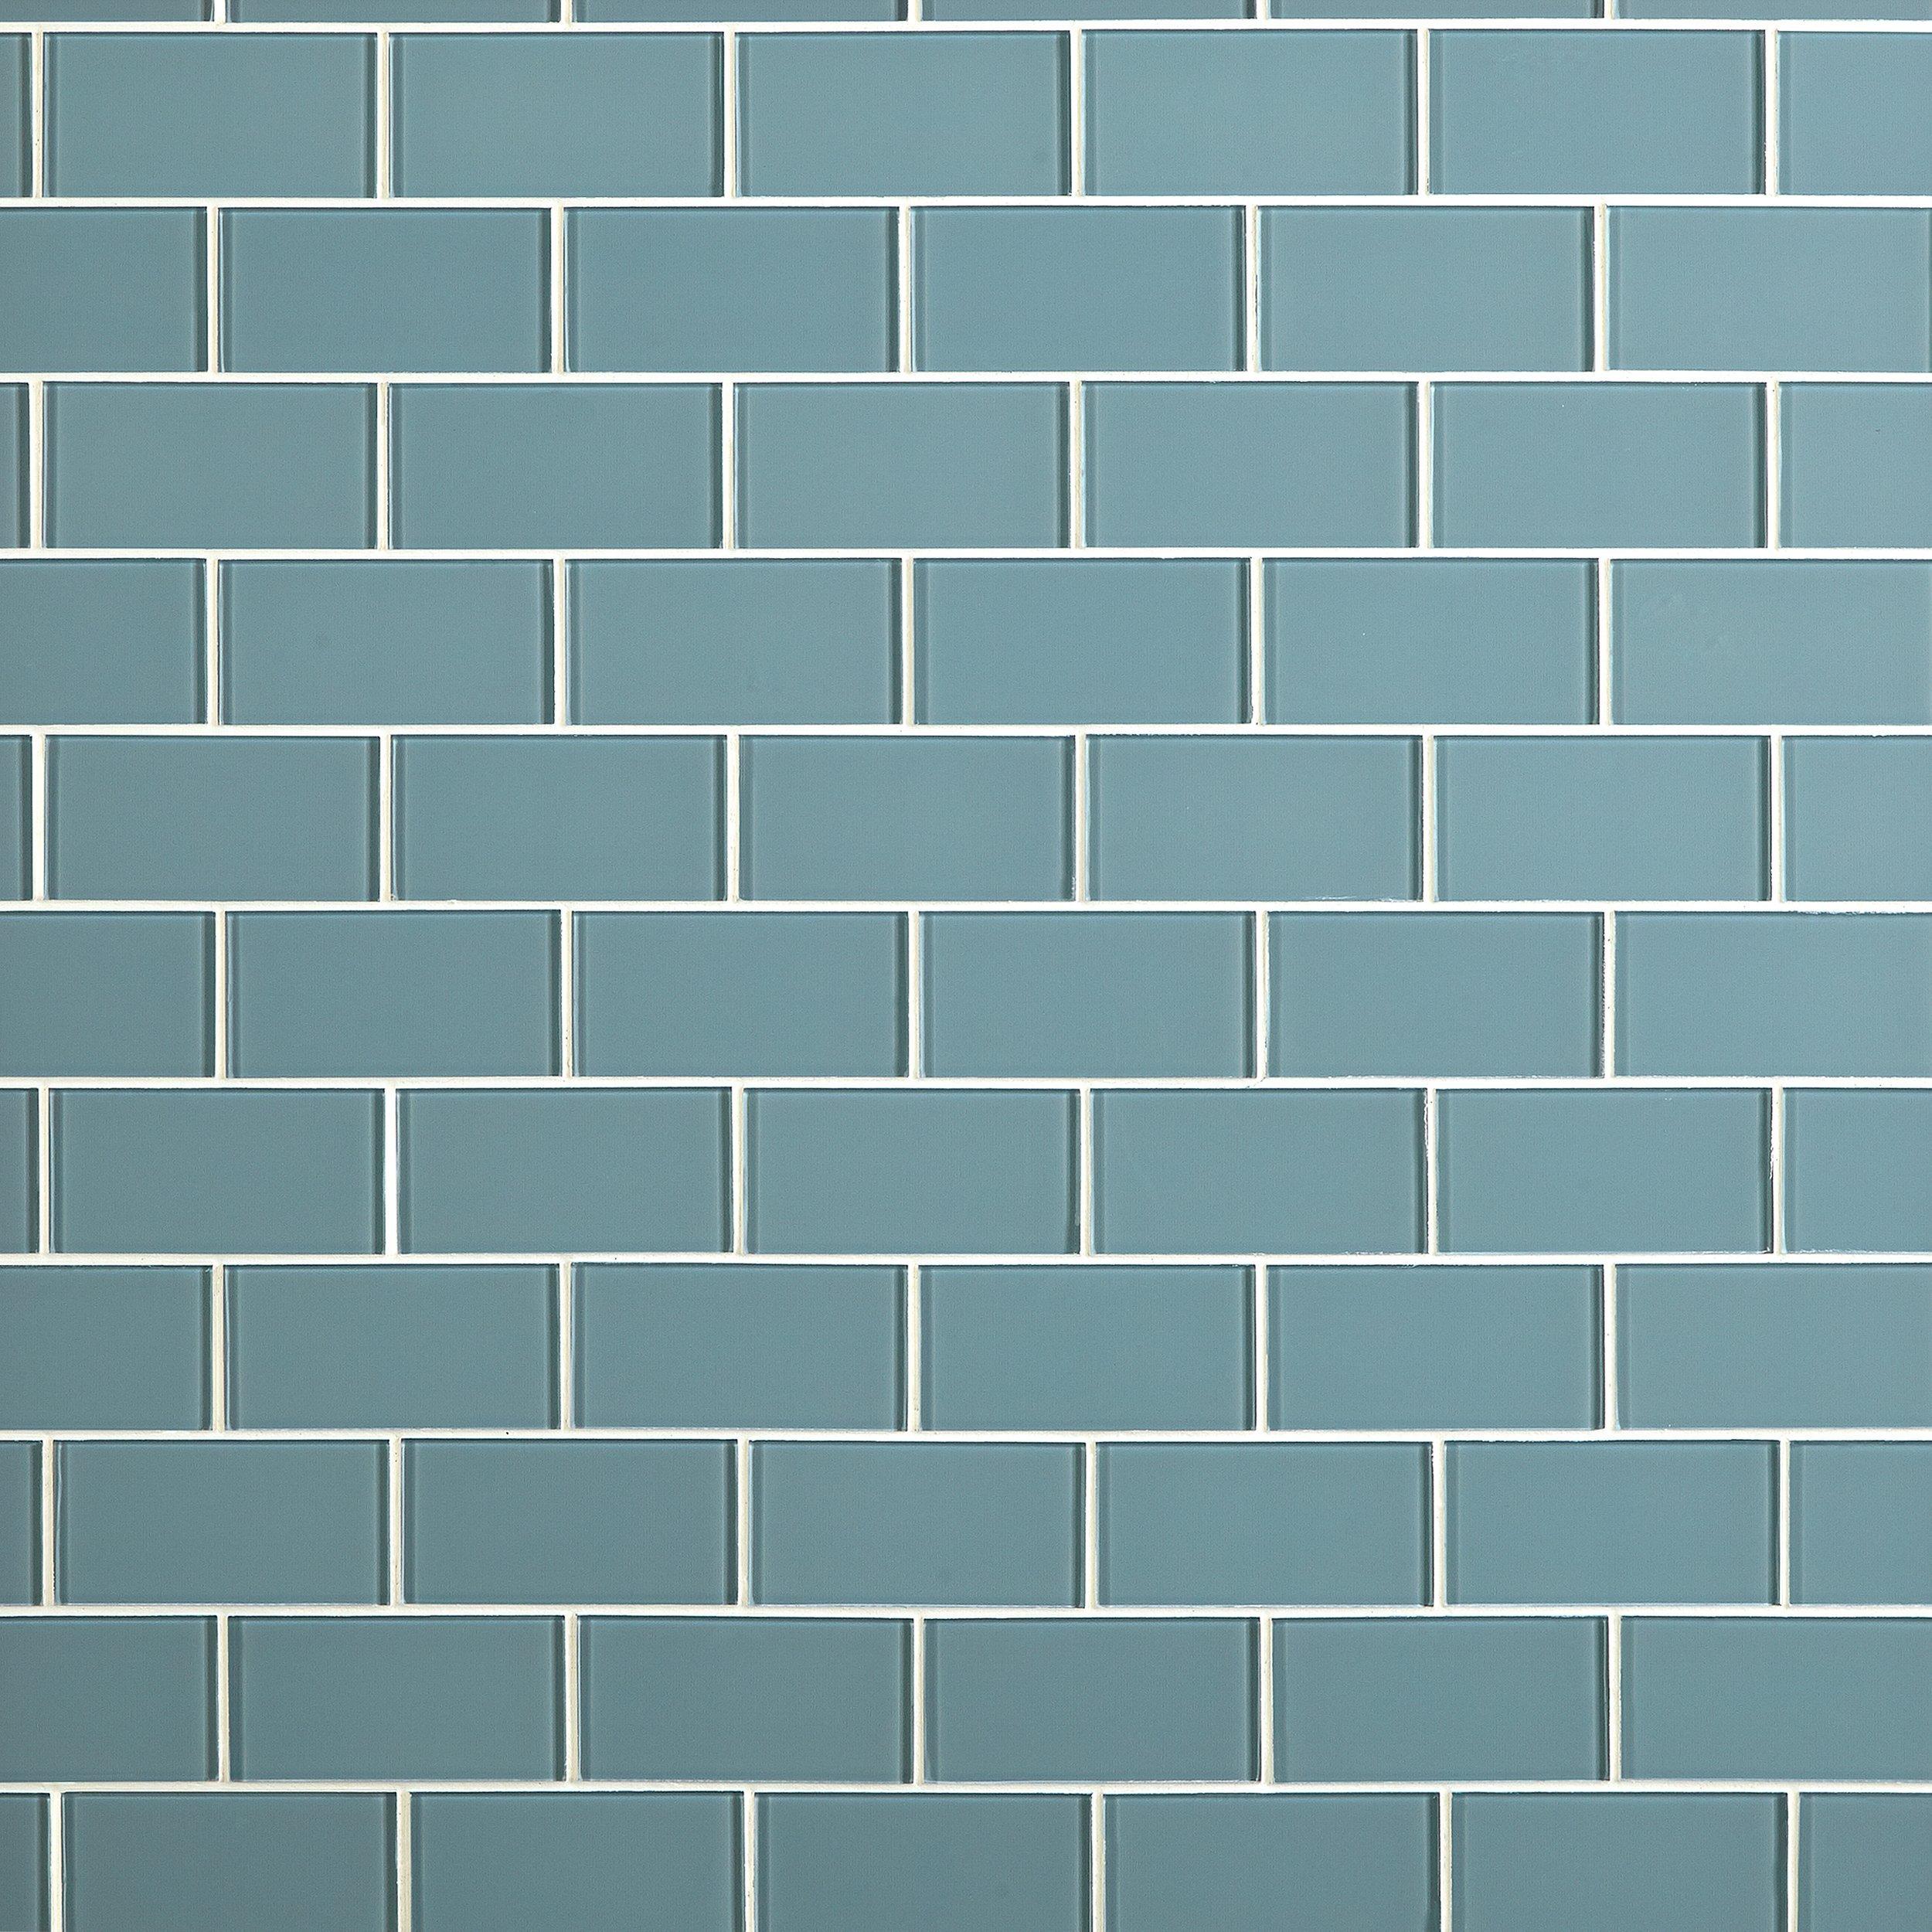 Spa Glass Tile - 3 x 6 - 913102050   Floor and Decor